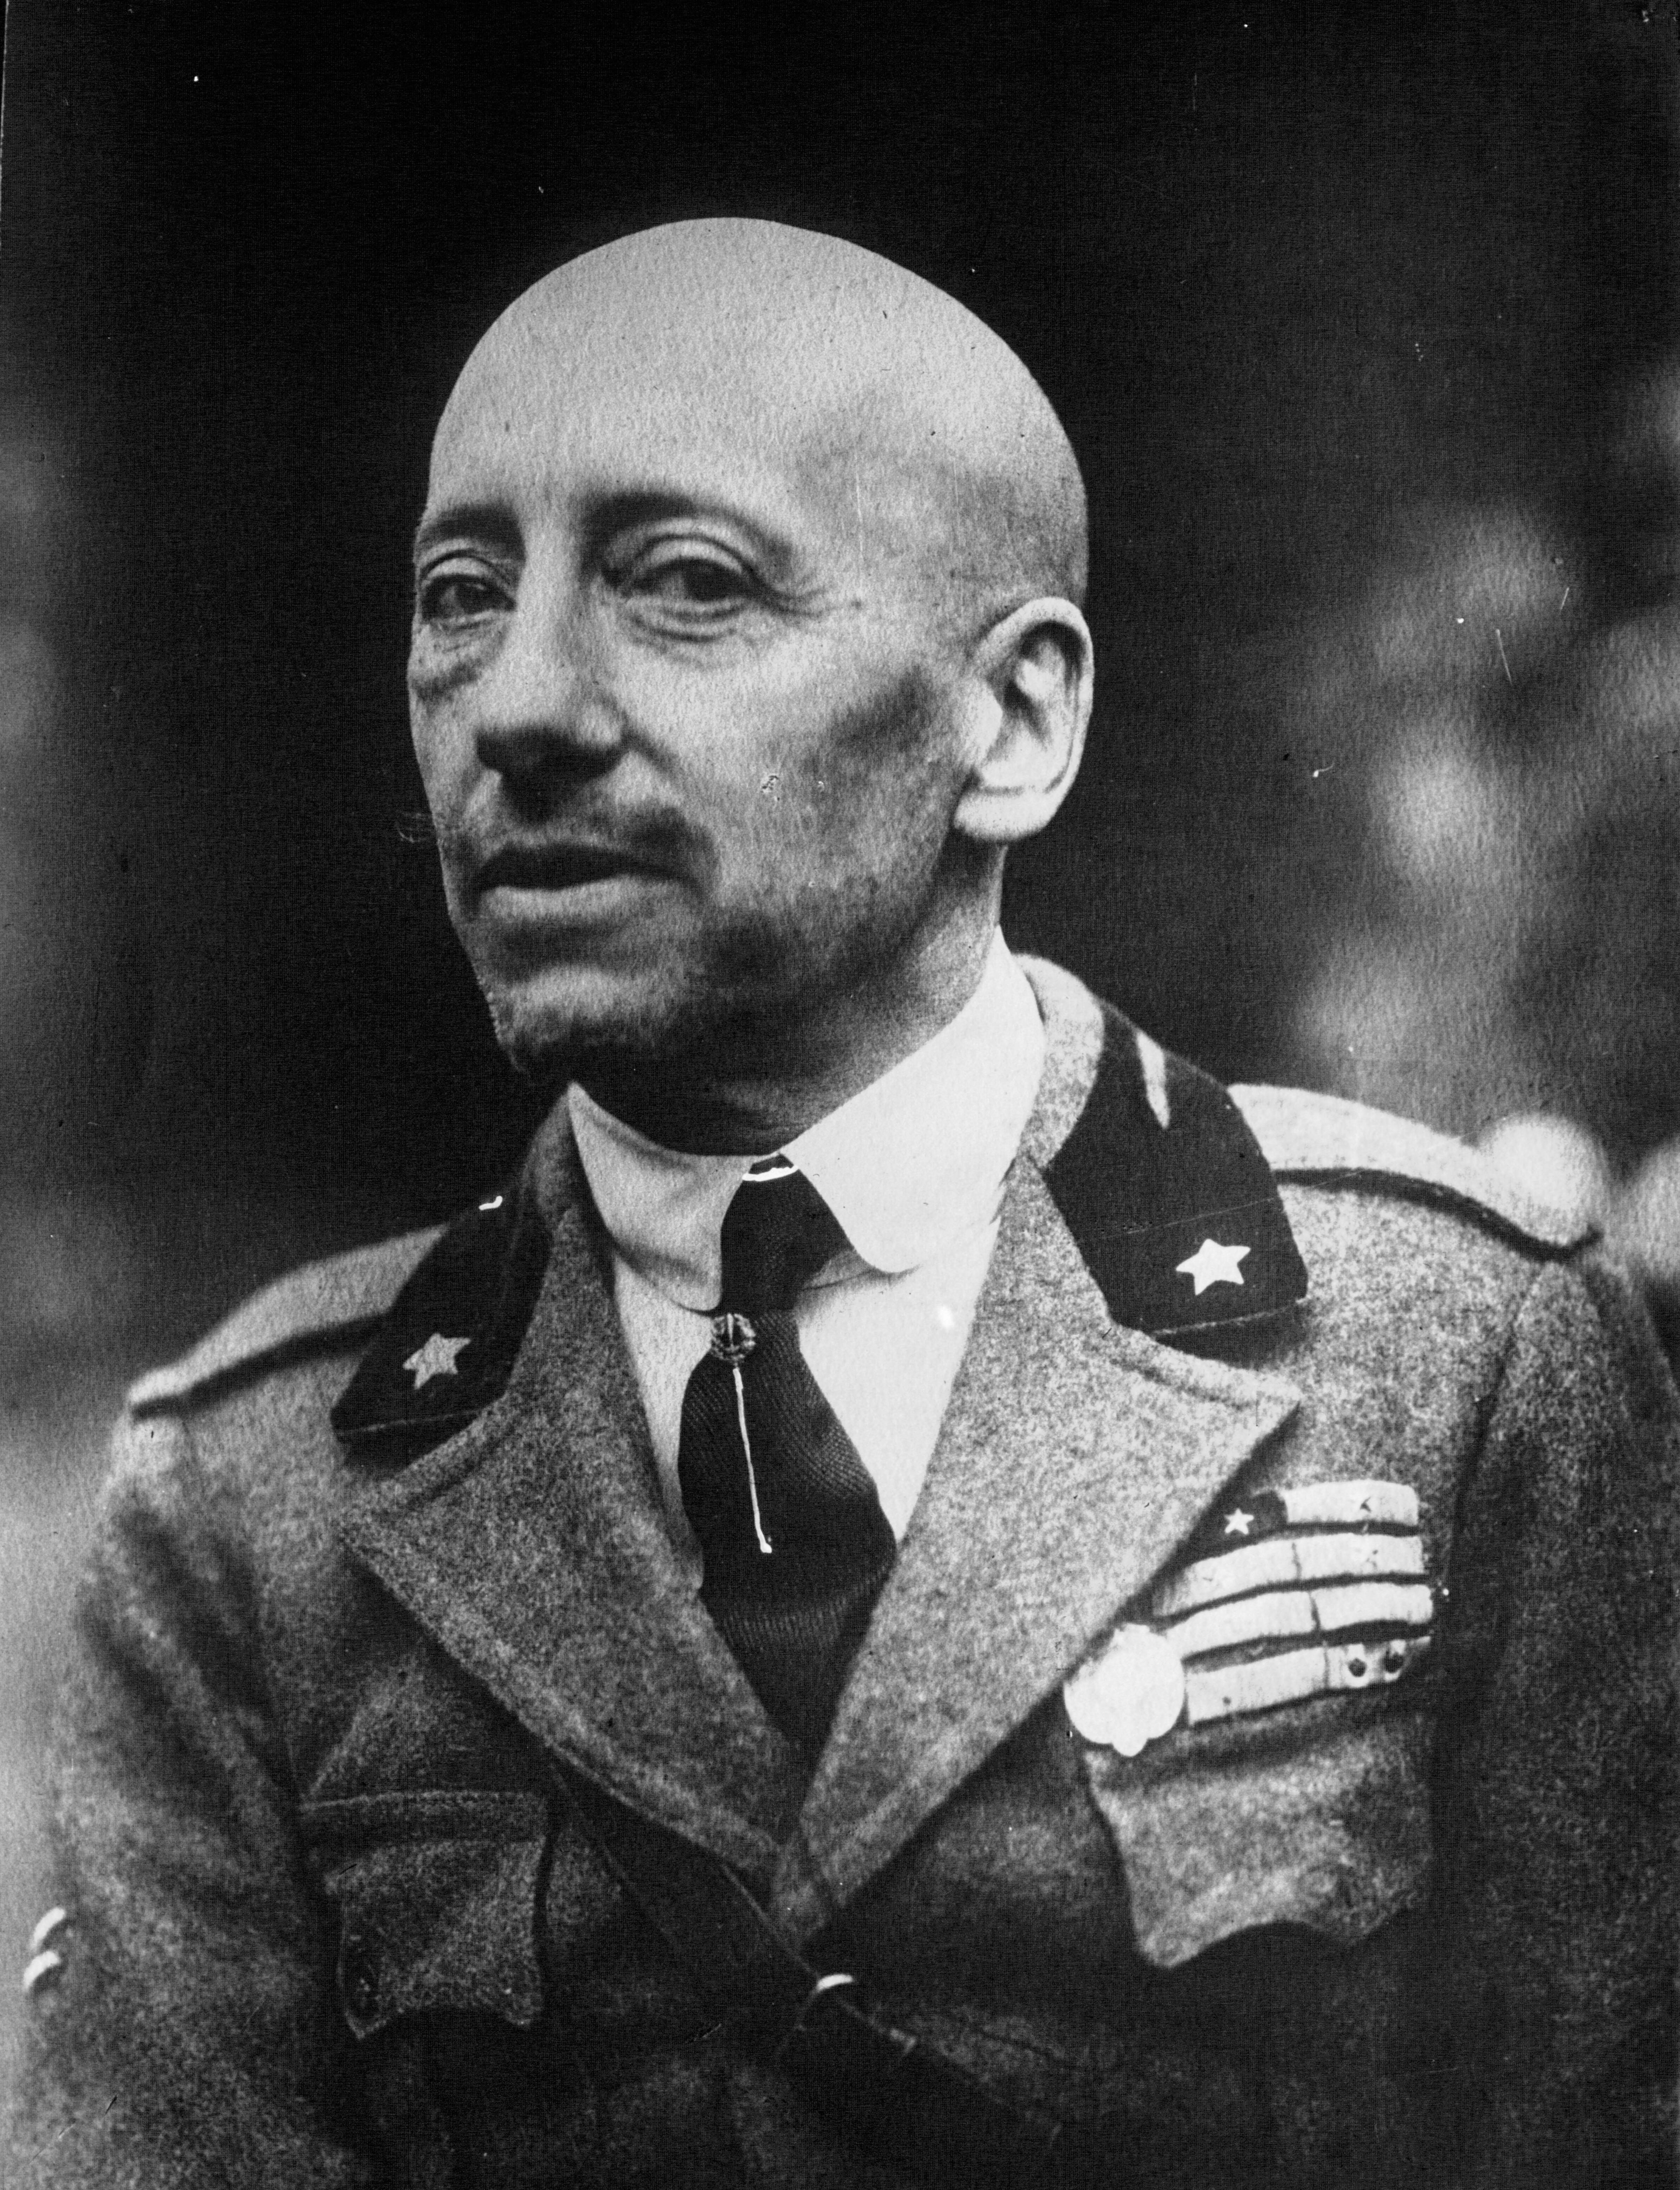 https://upload.wikimedia.org/wikipedia/commons/2/25/Gabriele_D%27Annunzio_1922.jpg